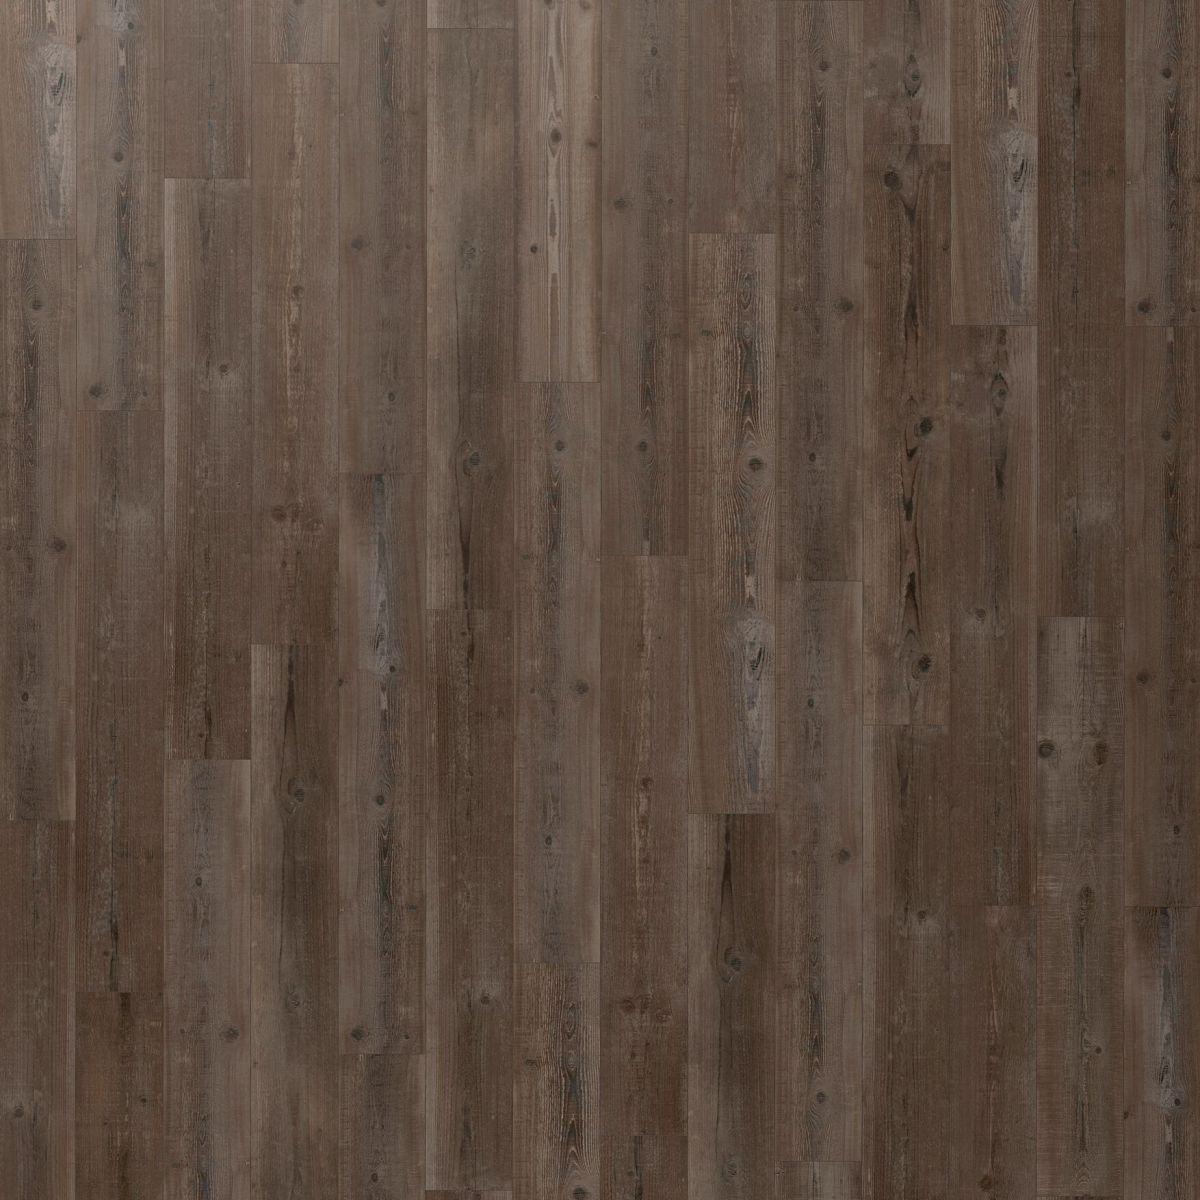 Avatara vloerdelen hout N09 plan